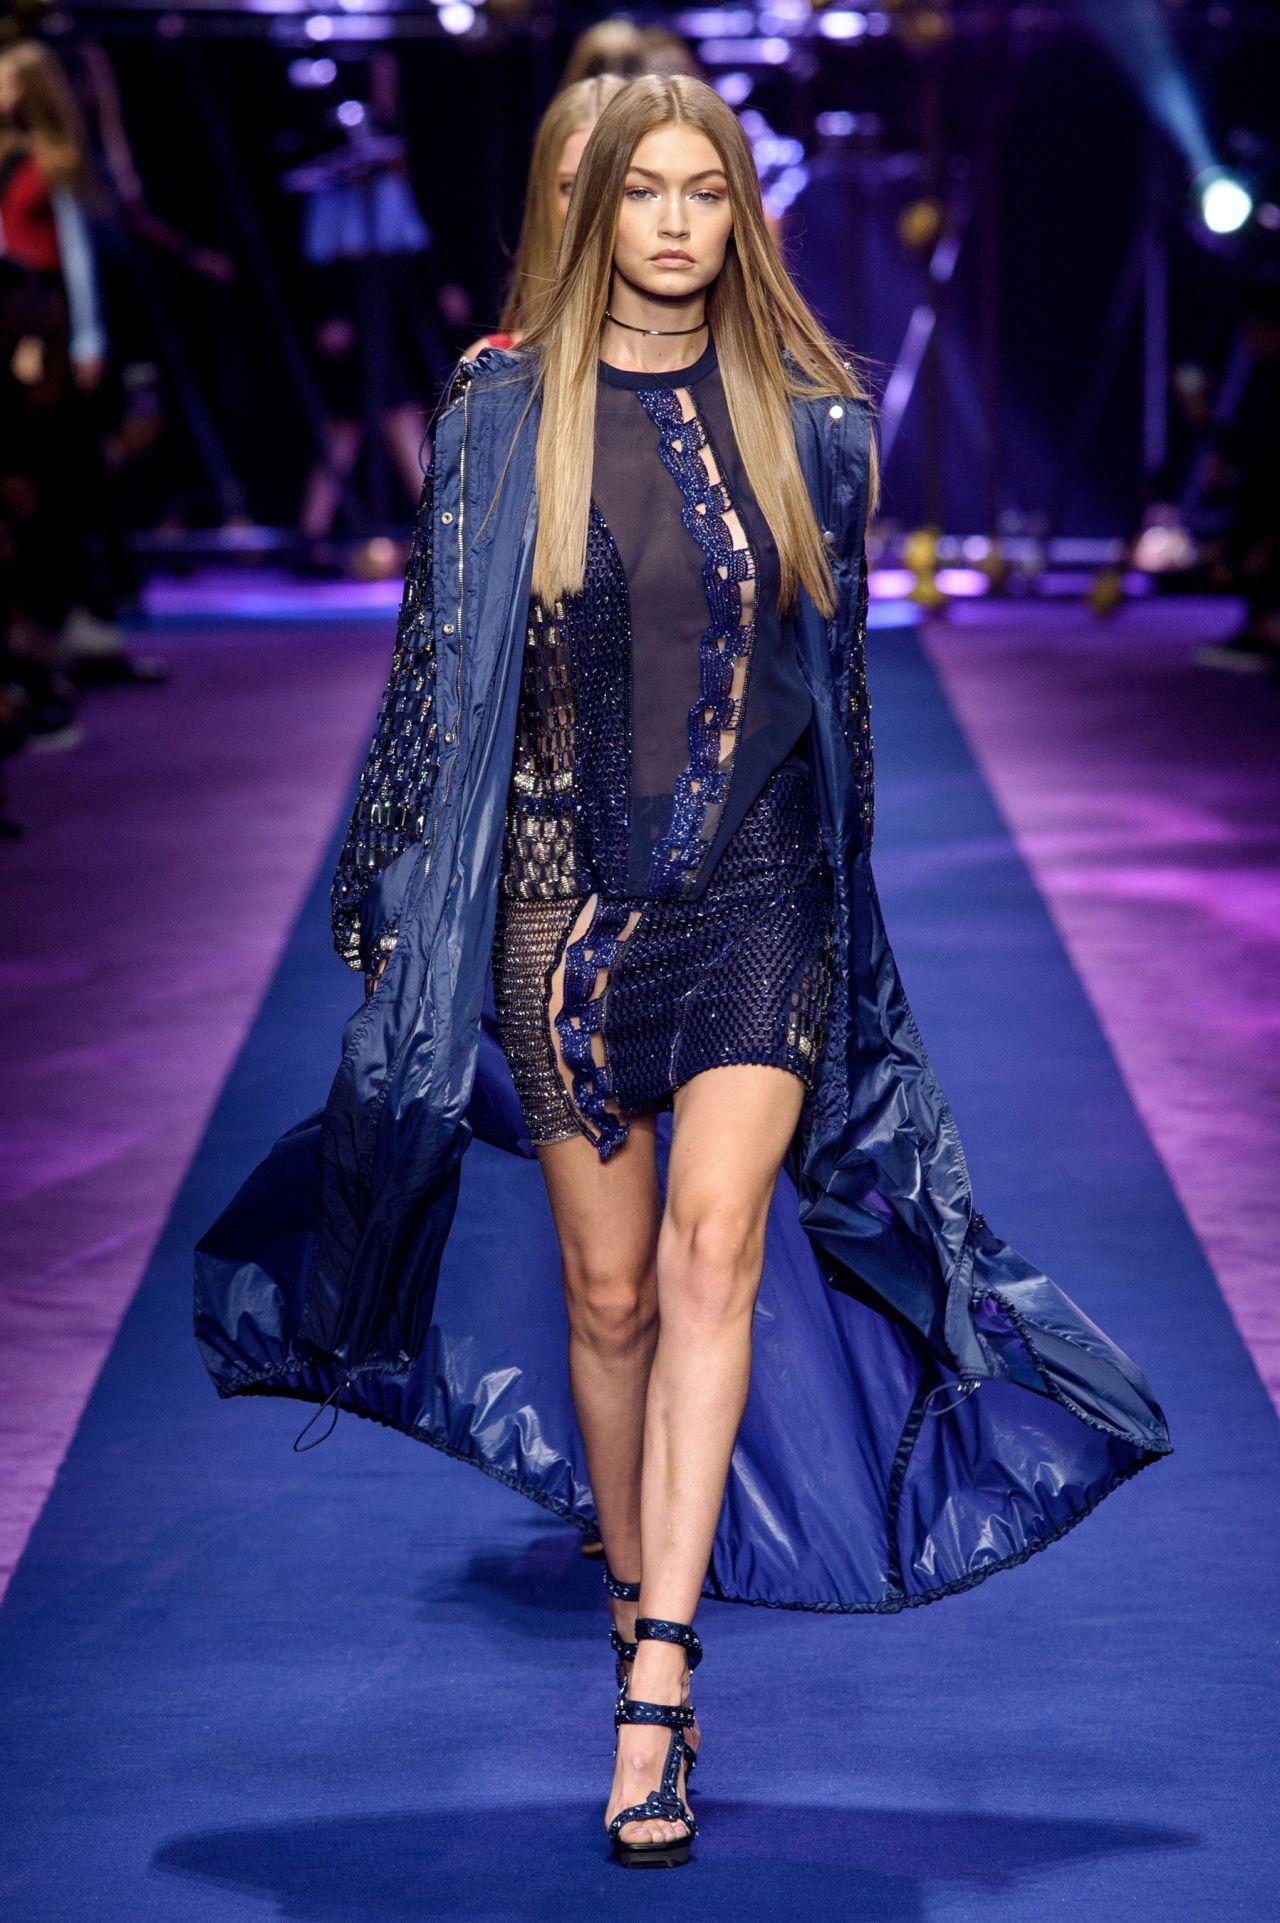 Gigi hadid versace s s 2017 show in milan september 2016 for Milan show 2016